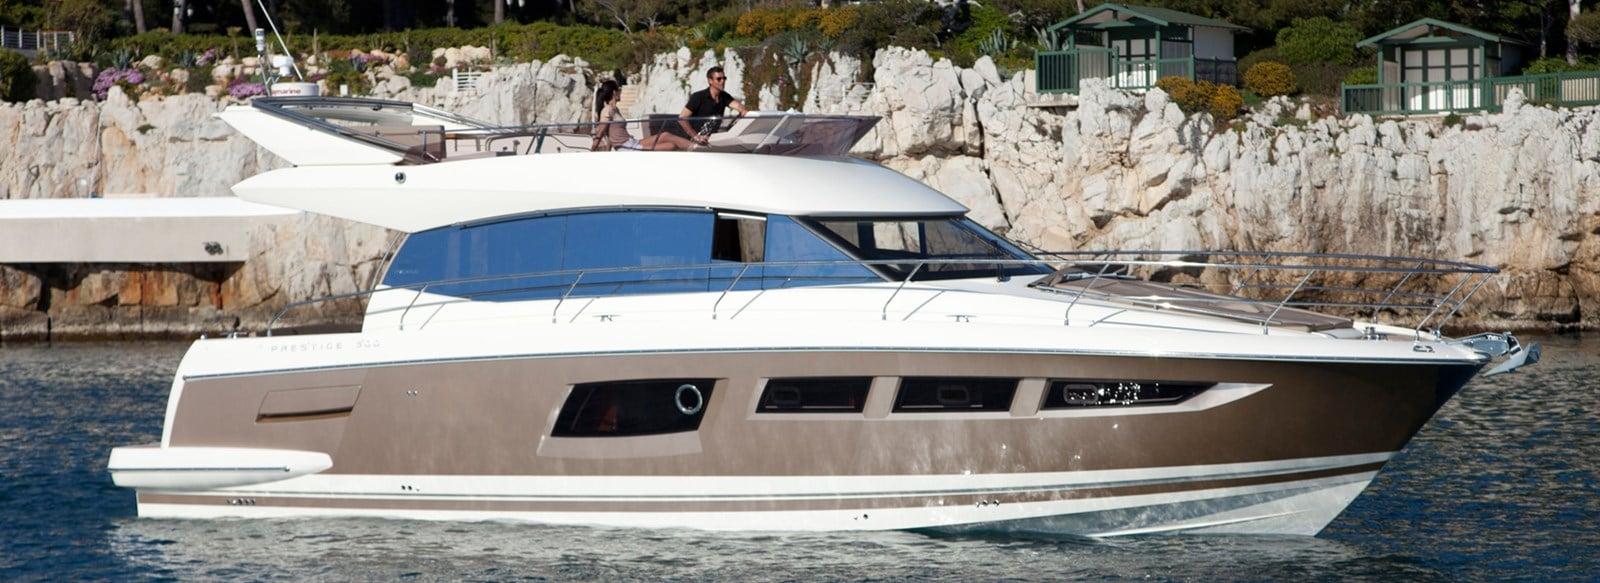 new prestige 500 flybridge yacht for sale